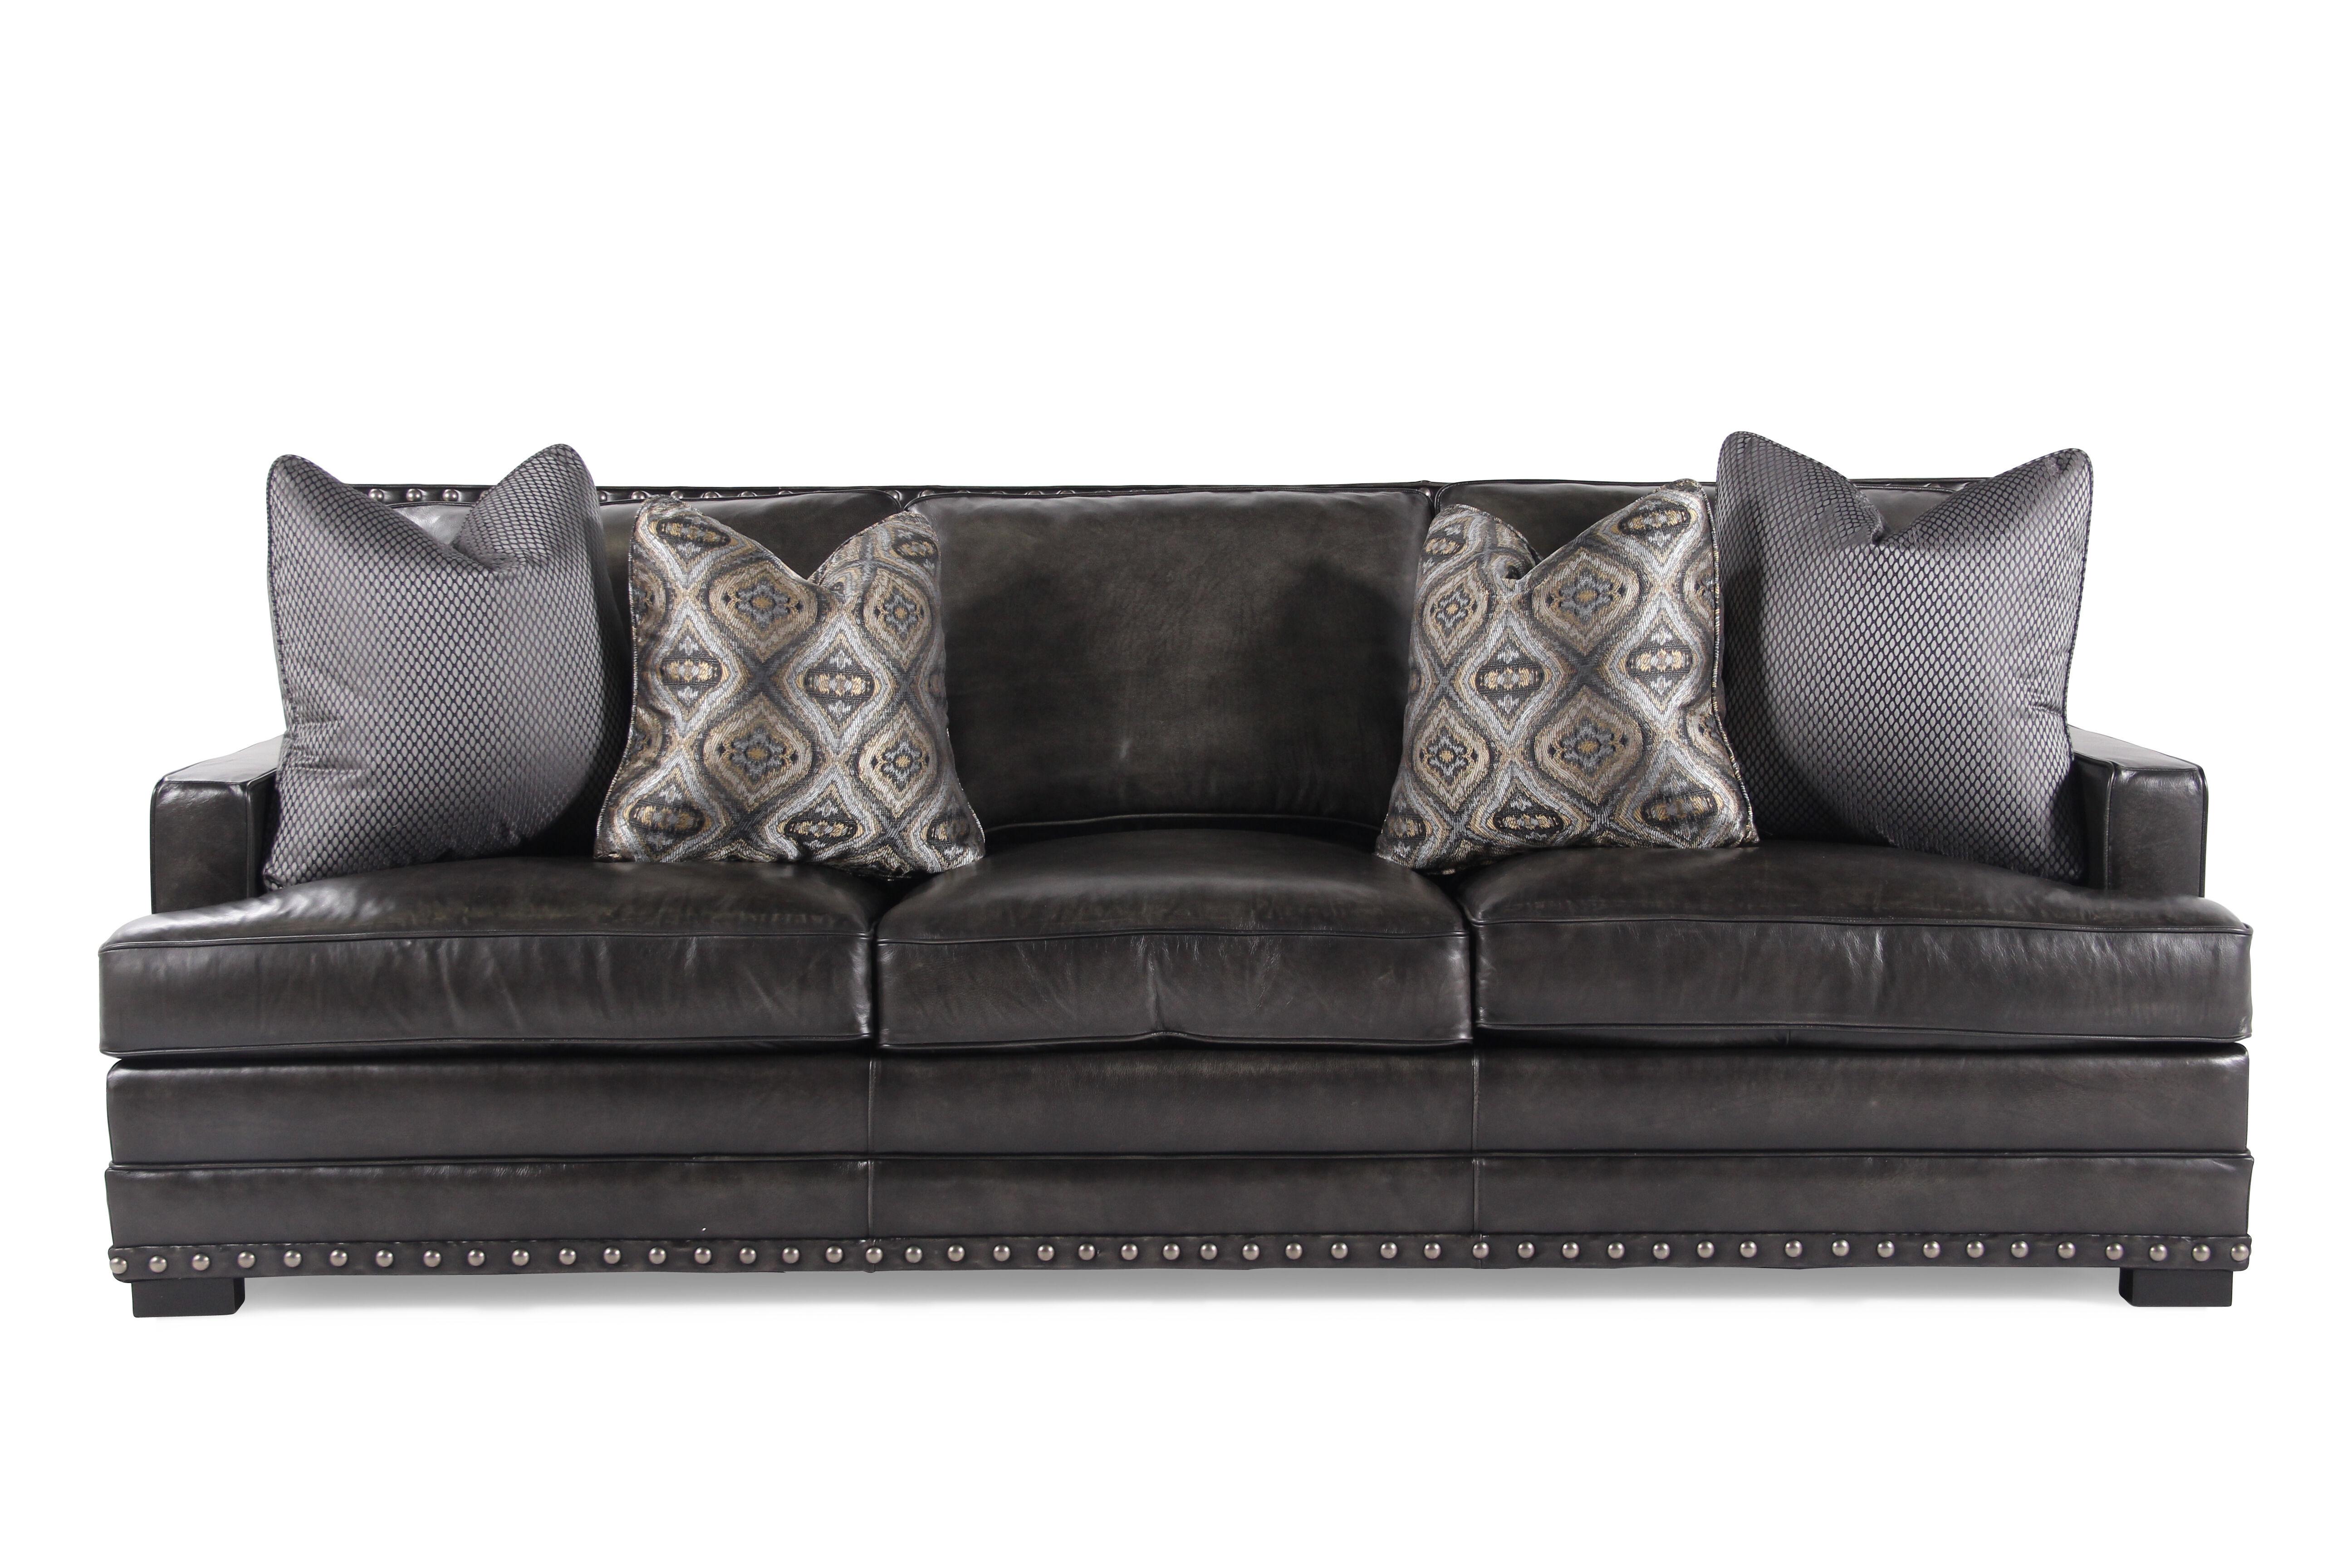 Images Nailhead Accented Leather 94u0026quot; Sofa In Graphite Nailhead Accented  Leather 94u0026quot; Sofa In Graphite